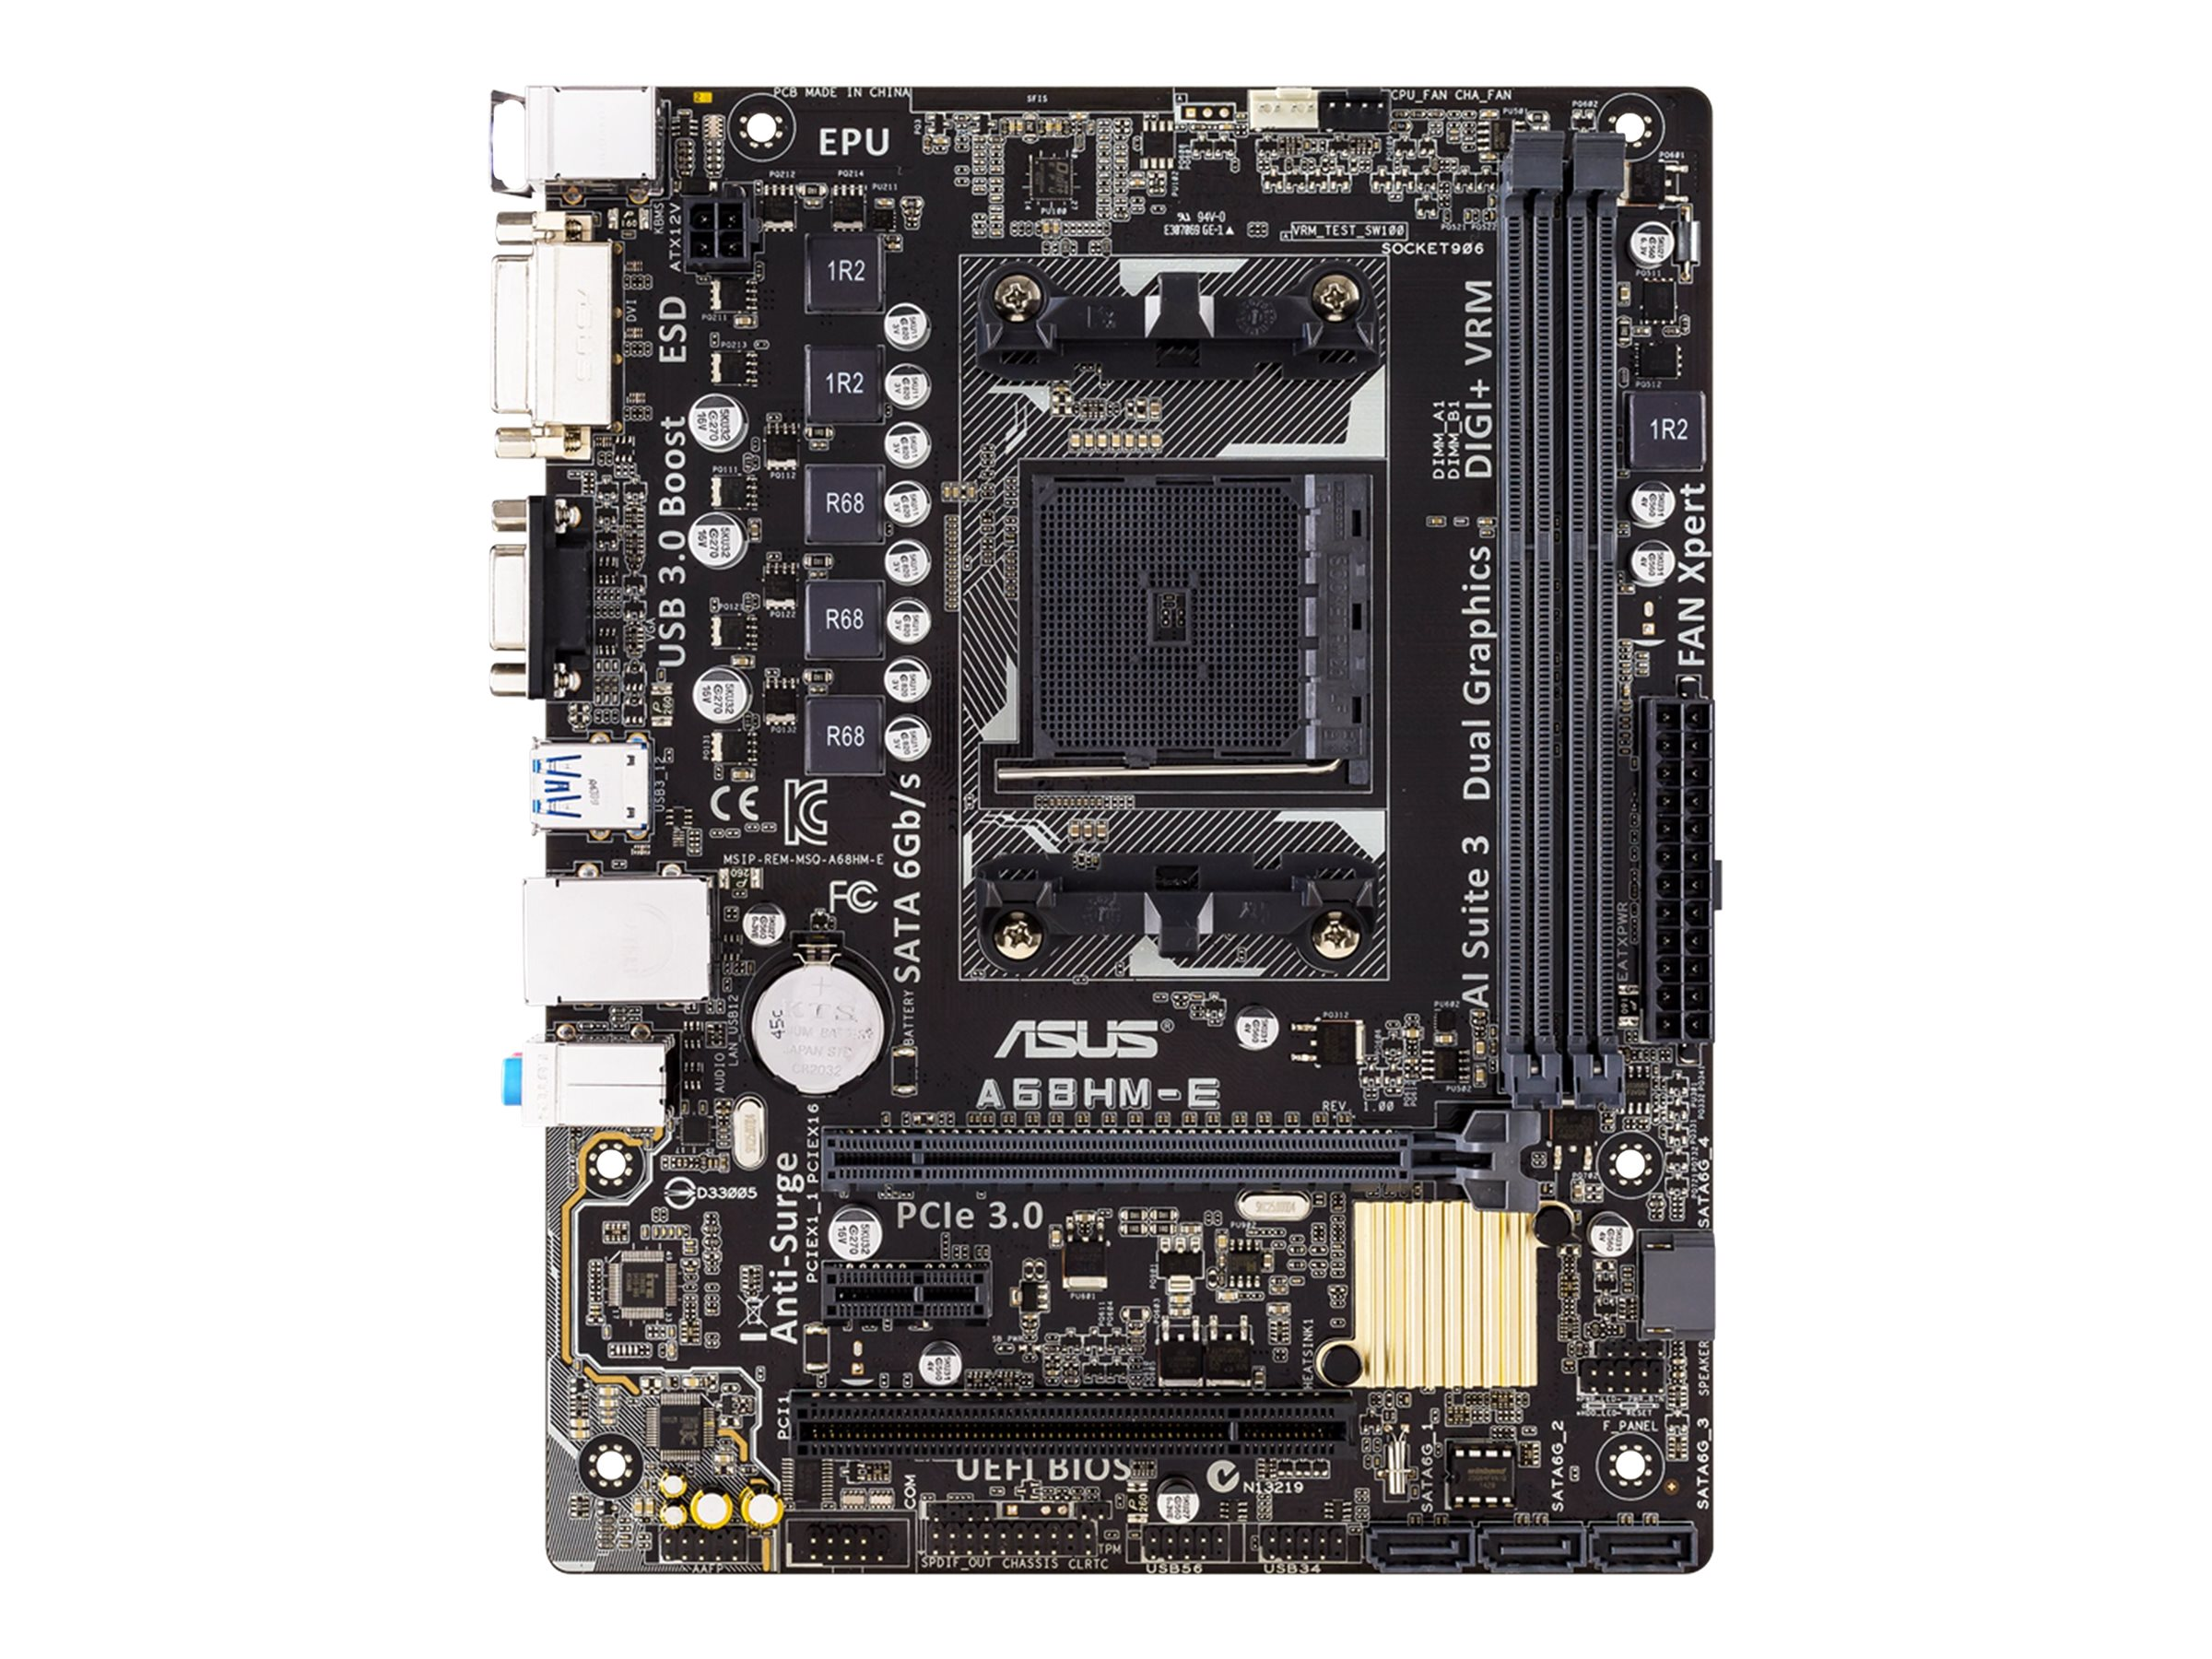 Asus Motherboard, mATX A68H FCH FM2+ Athlon- A-Series Max.32GB DDR3 4xSATA 2xPCIe GbE, A68HM-E, 18184178, Motherboards